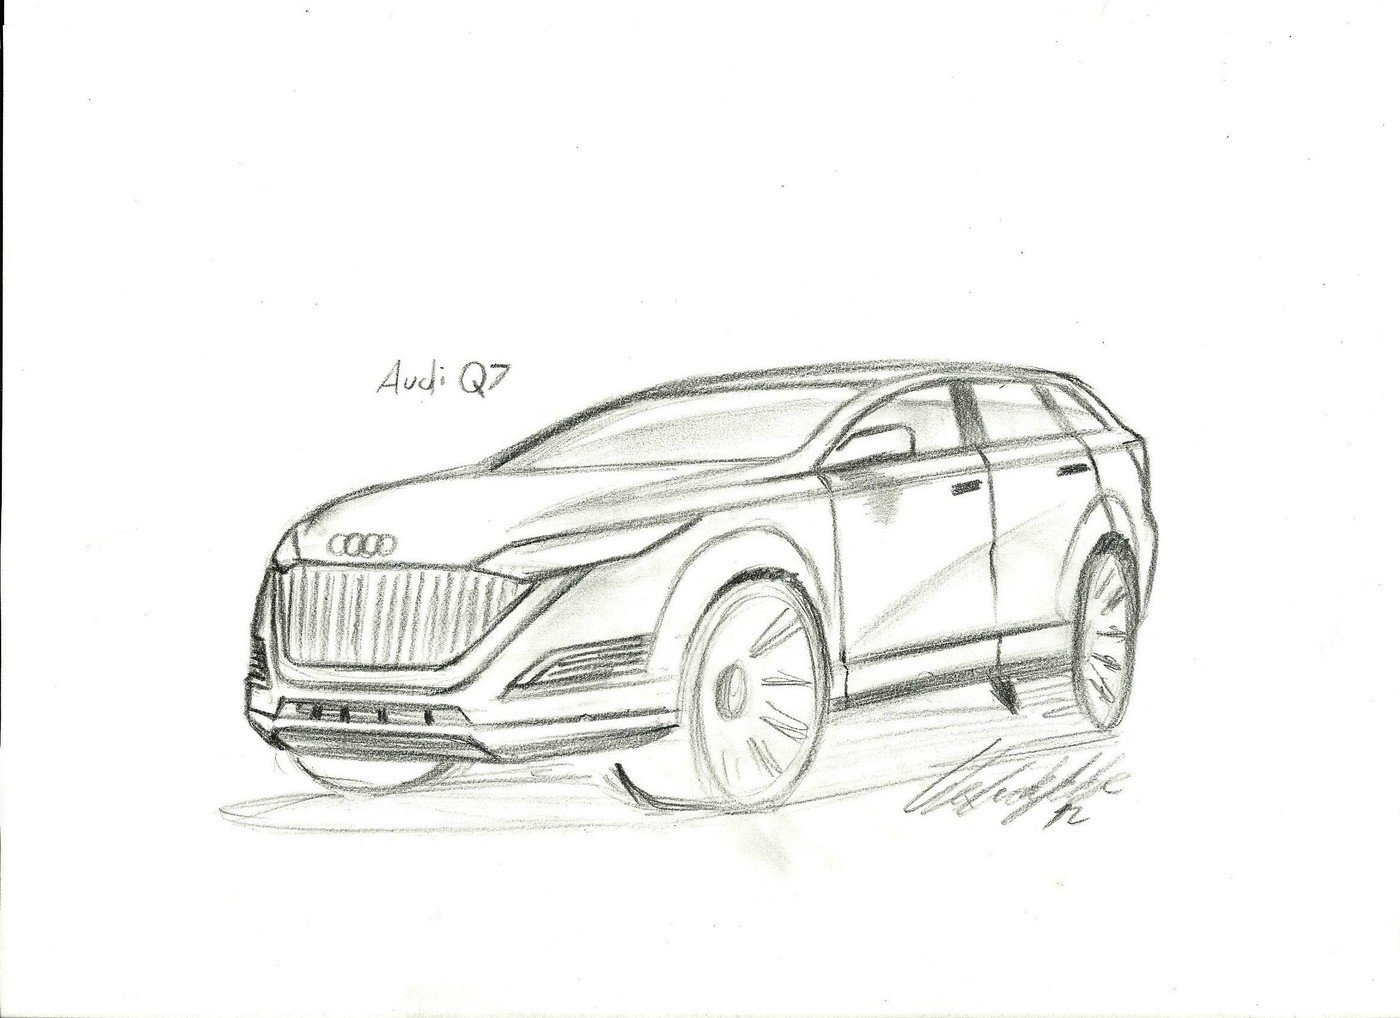 Facelift Audi Q7 By Alexandre Felipe Ribeiro Da Silva At